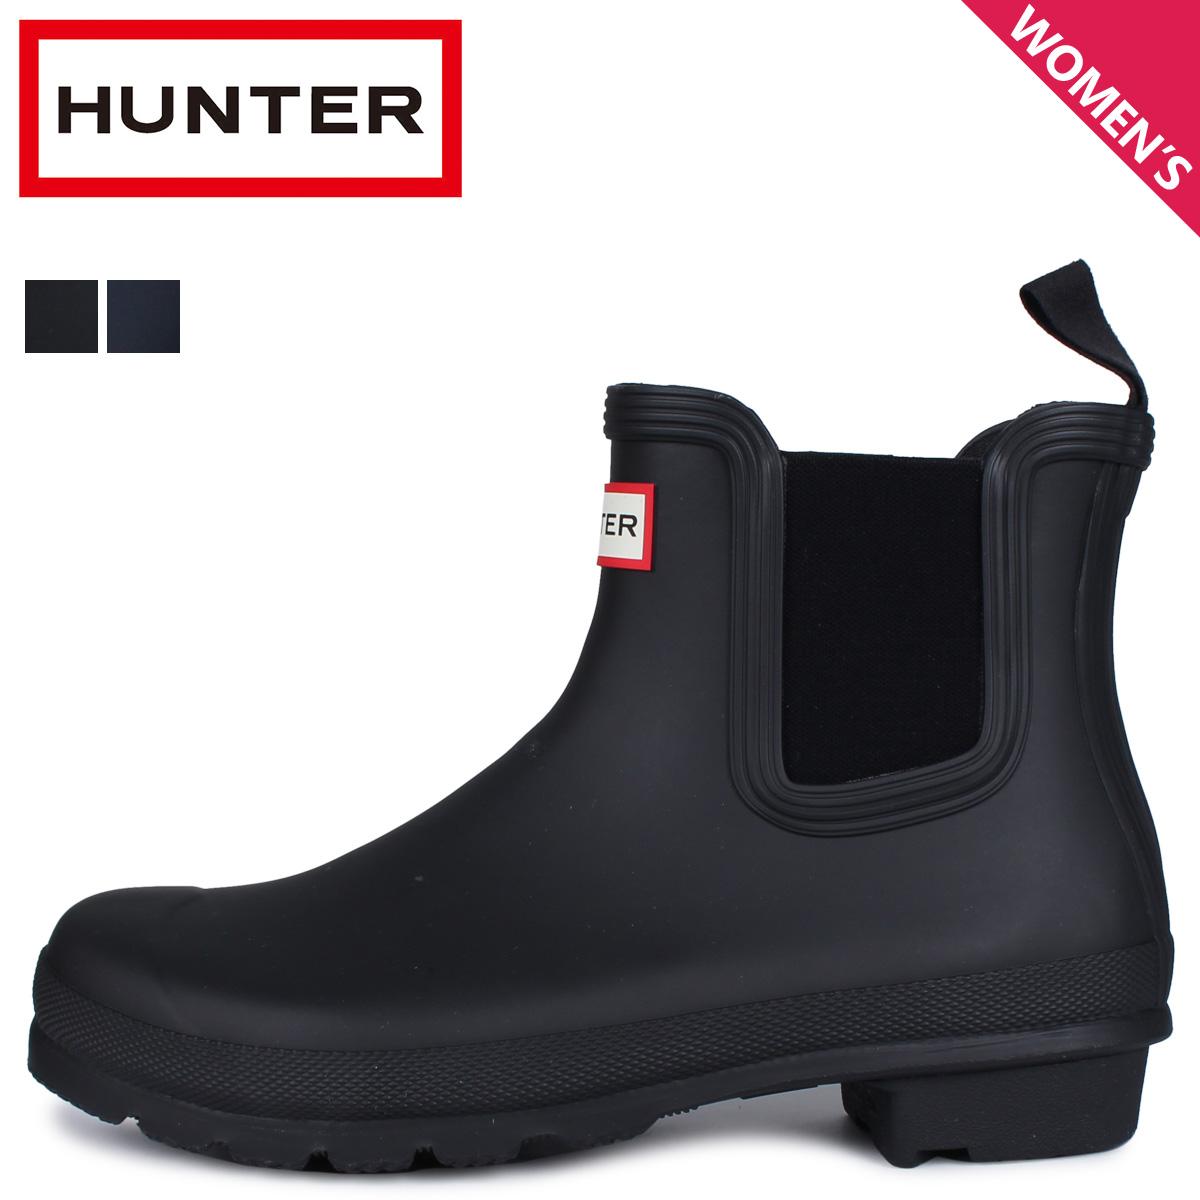 HUNTER ハンター レインブーツ 長靴 ショート ブーツ チェルシーブーツ オリジナル レディース WOMENS ORIGINAL CHELSEA ブラック ネイビー 黒 WFS2078RMA